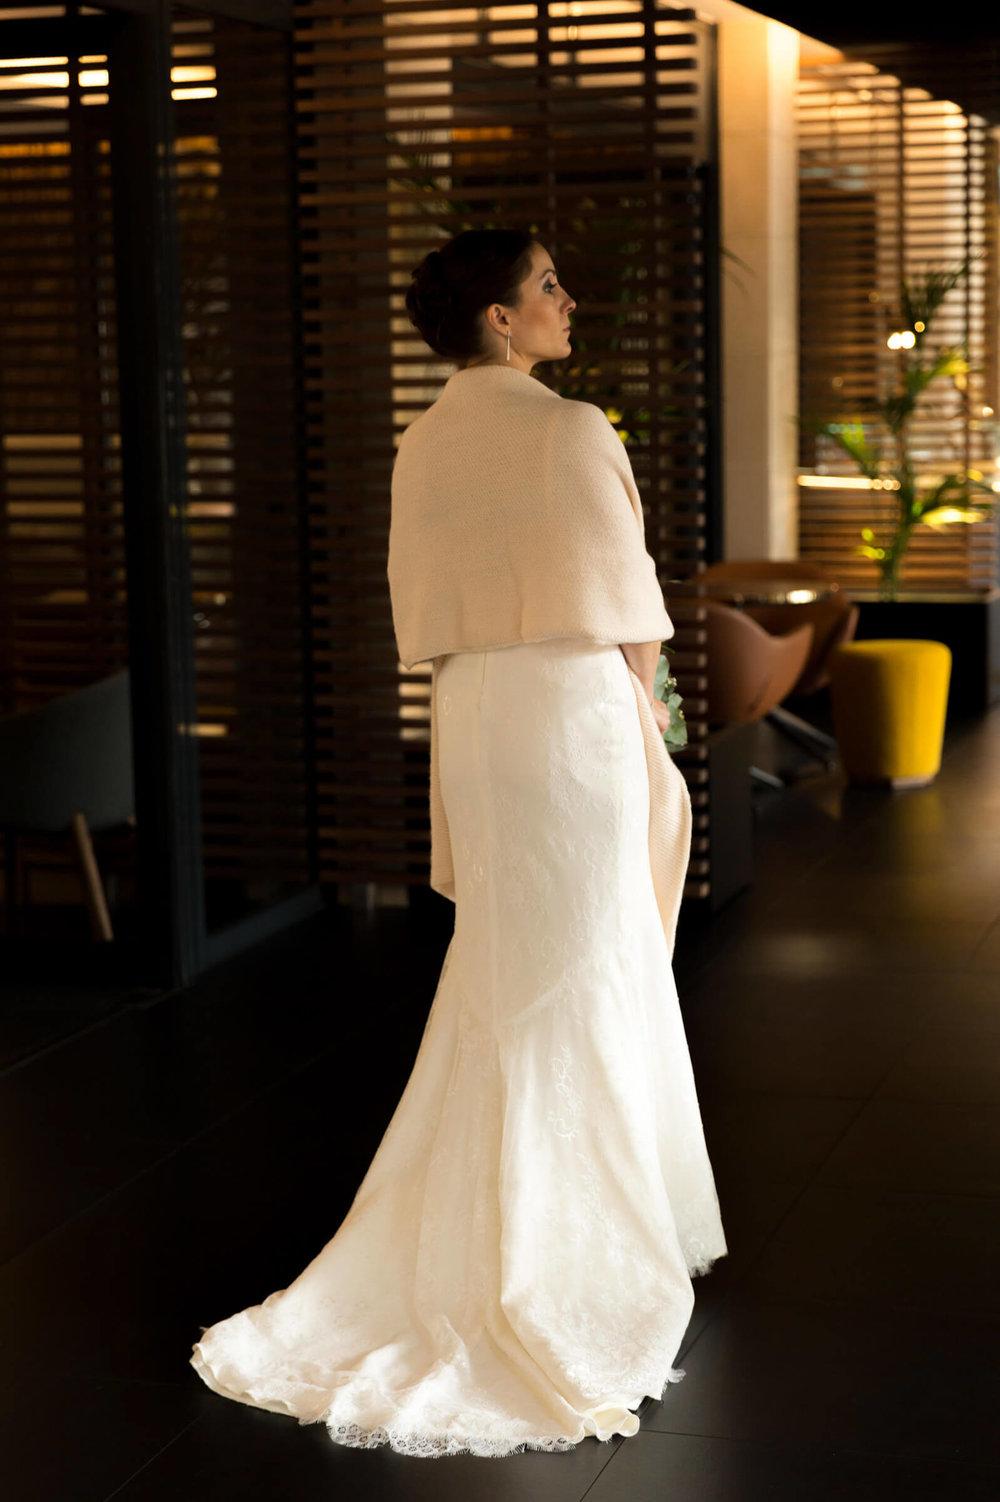 Photographe epernay Photo mariage Tristan Meunier-5.jpg